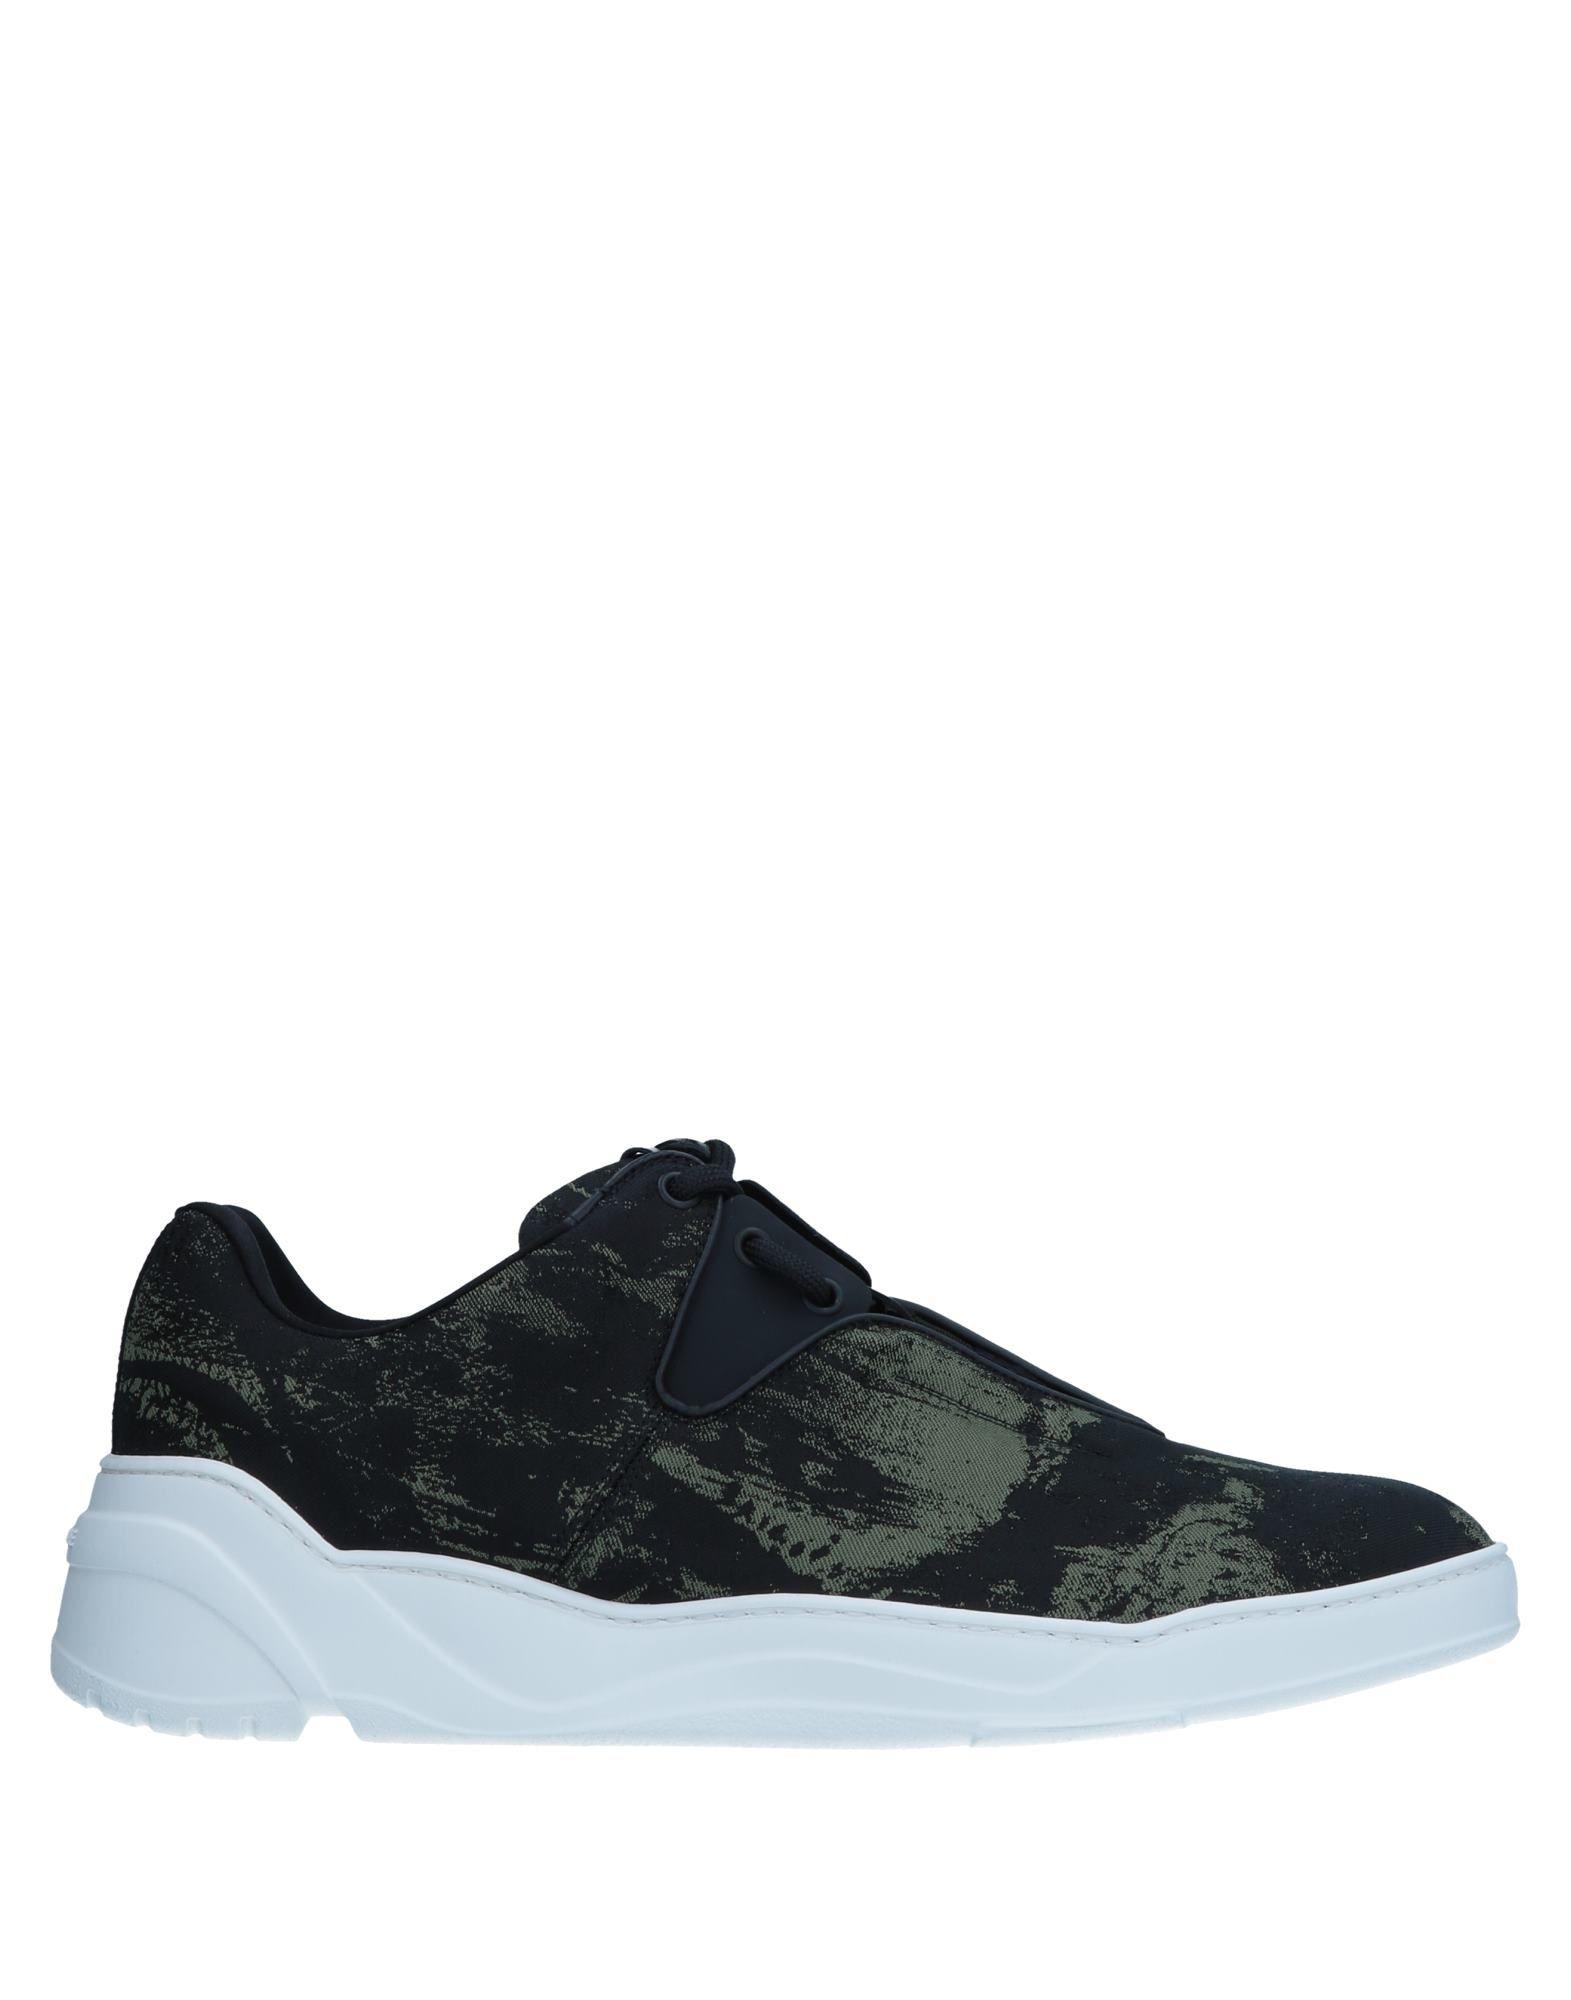 Dior Homme Sneakers Herren  Schuhe 11556159MB Gute Qualität beliebte Schuhe  c190a1